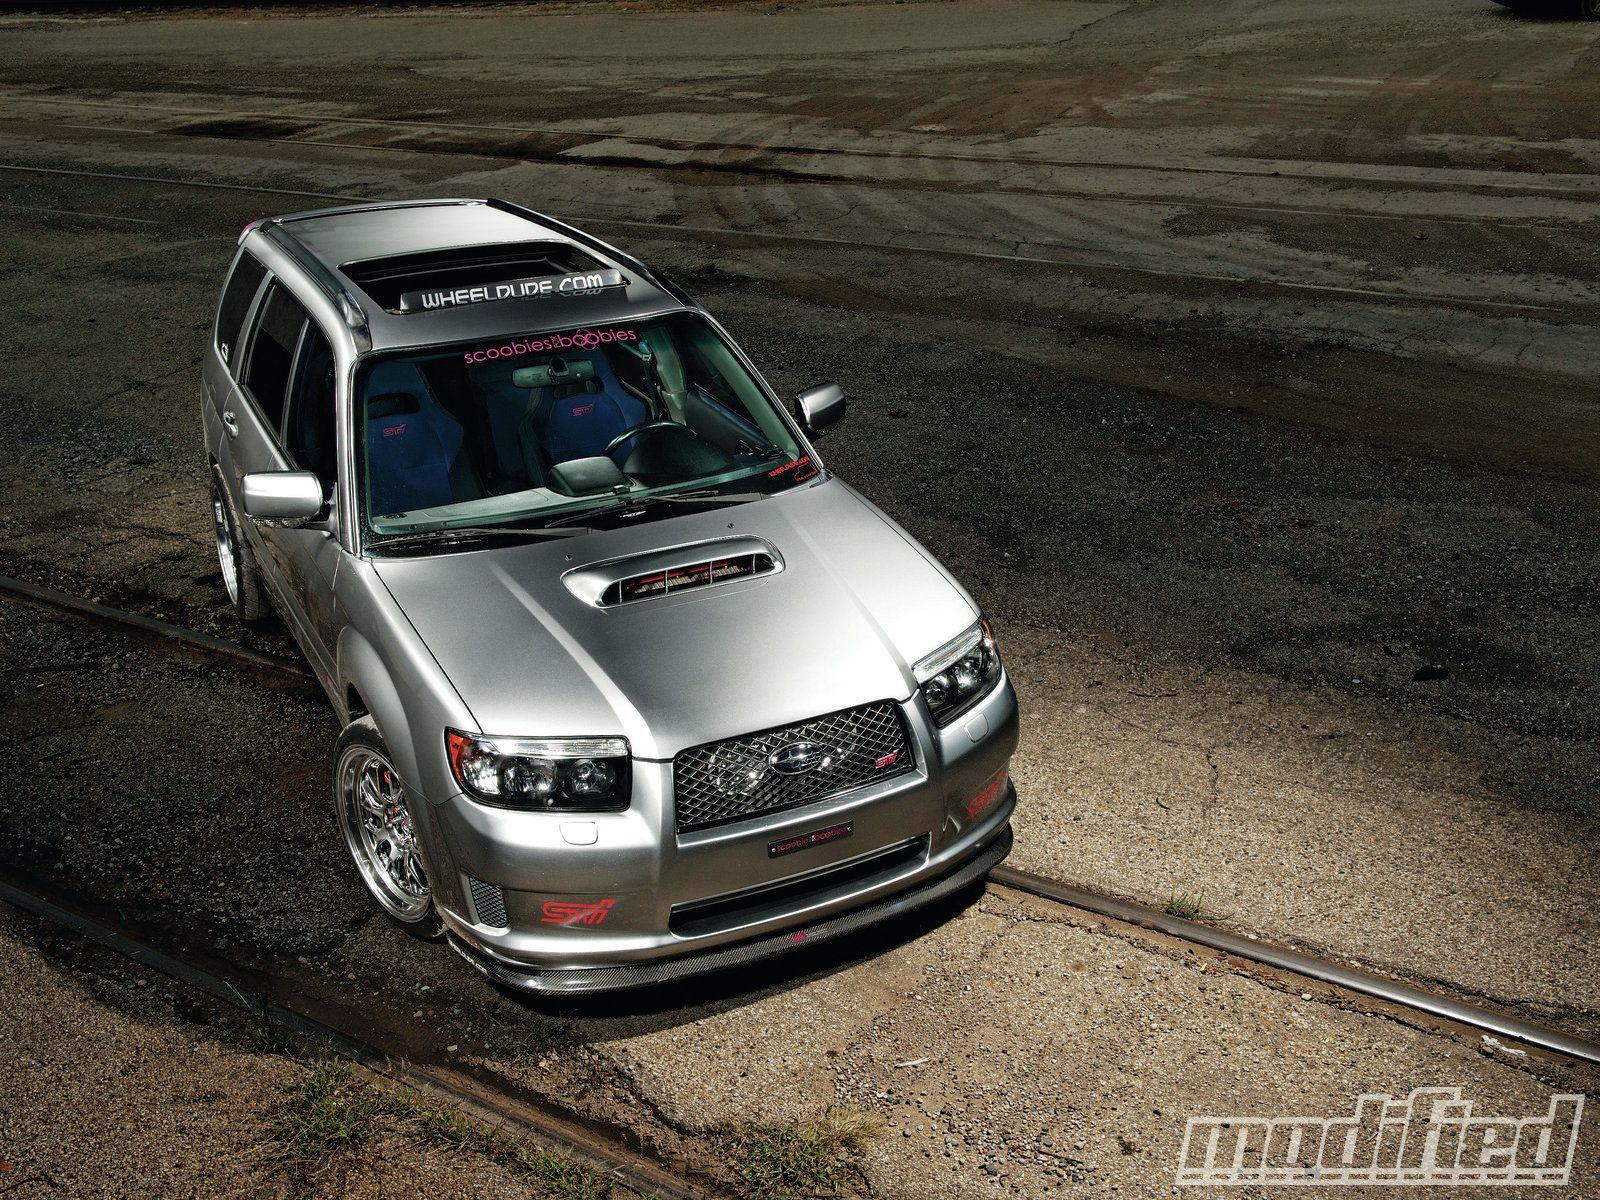 Subaru forester xt 4istirs pinterest subaru forester xt subaru forester xt vanachro Gallery